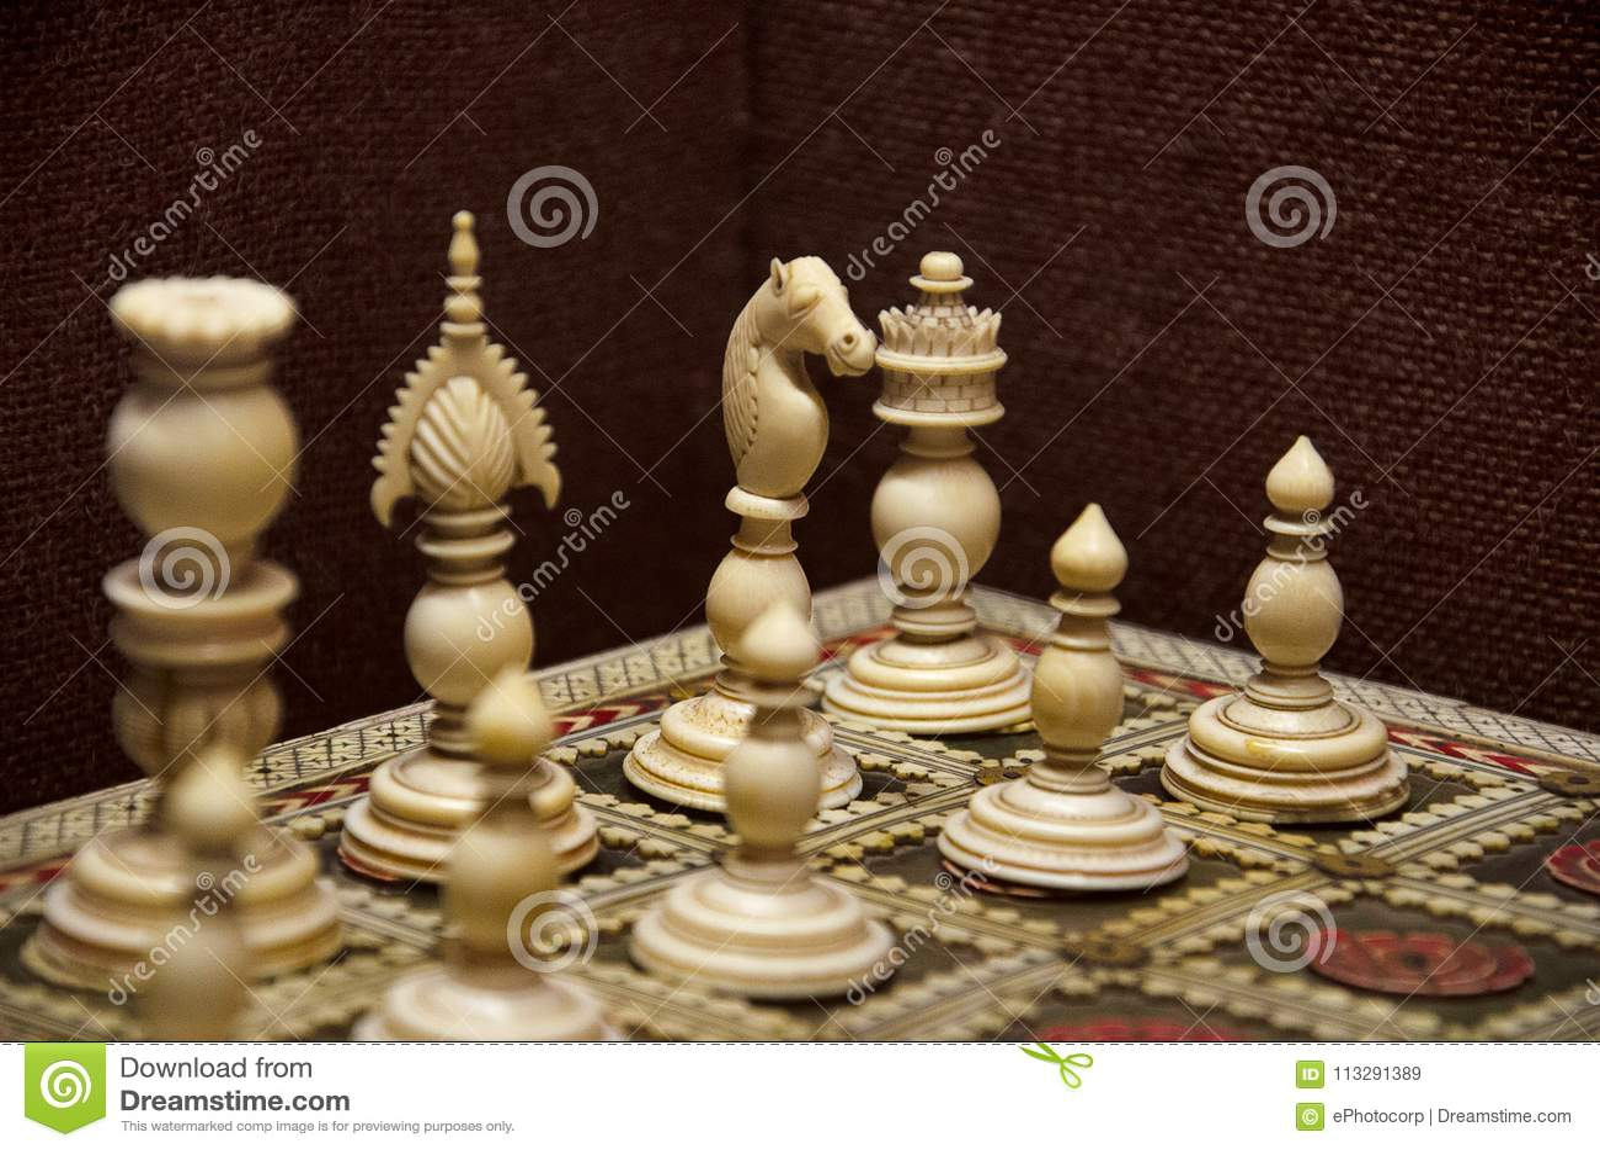 От старинных до кибер шахмат - Шахматная школа